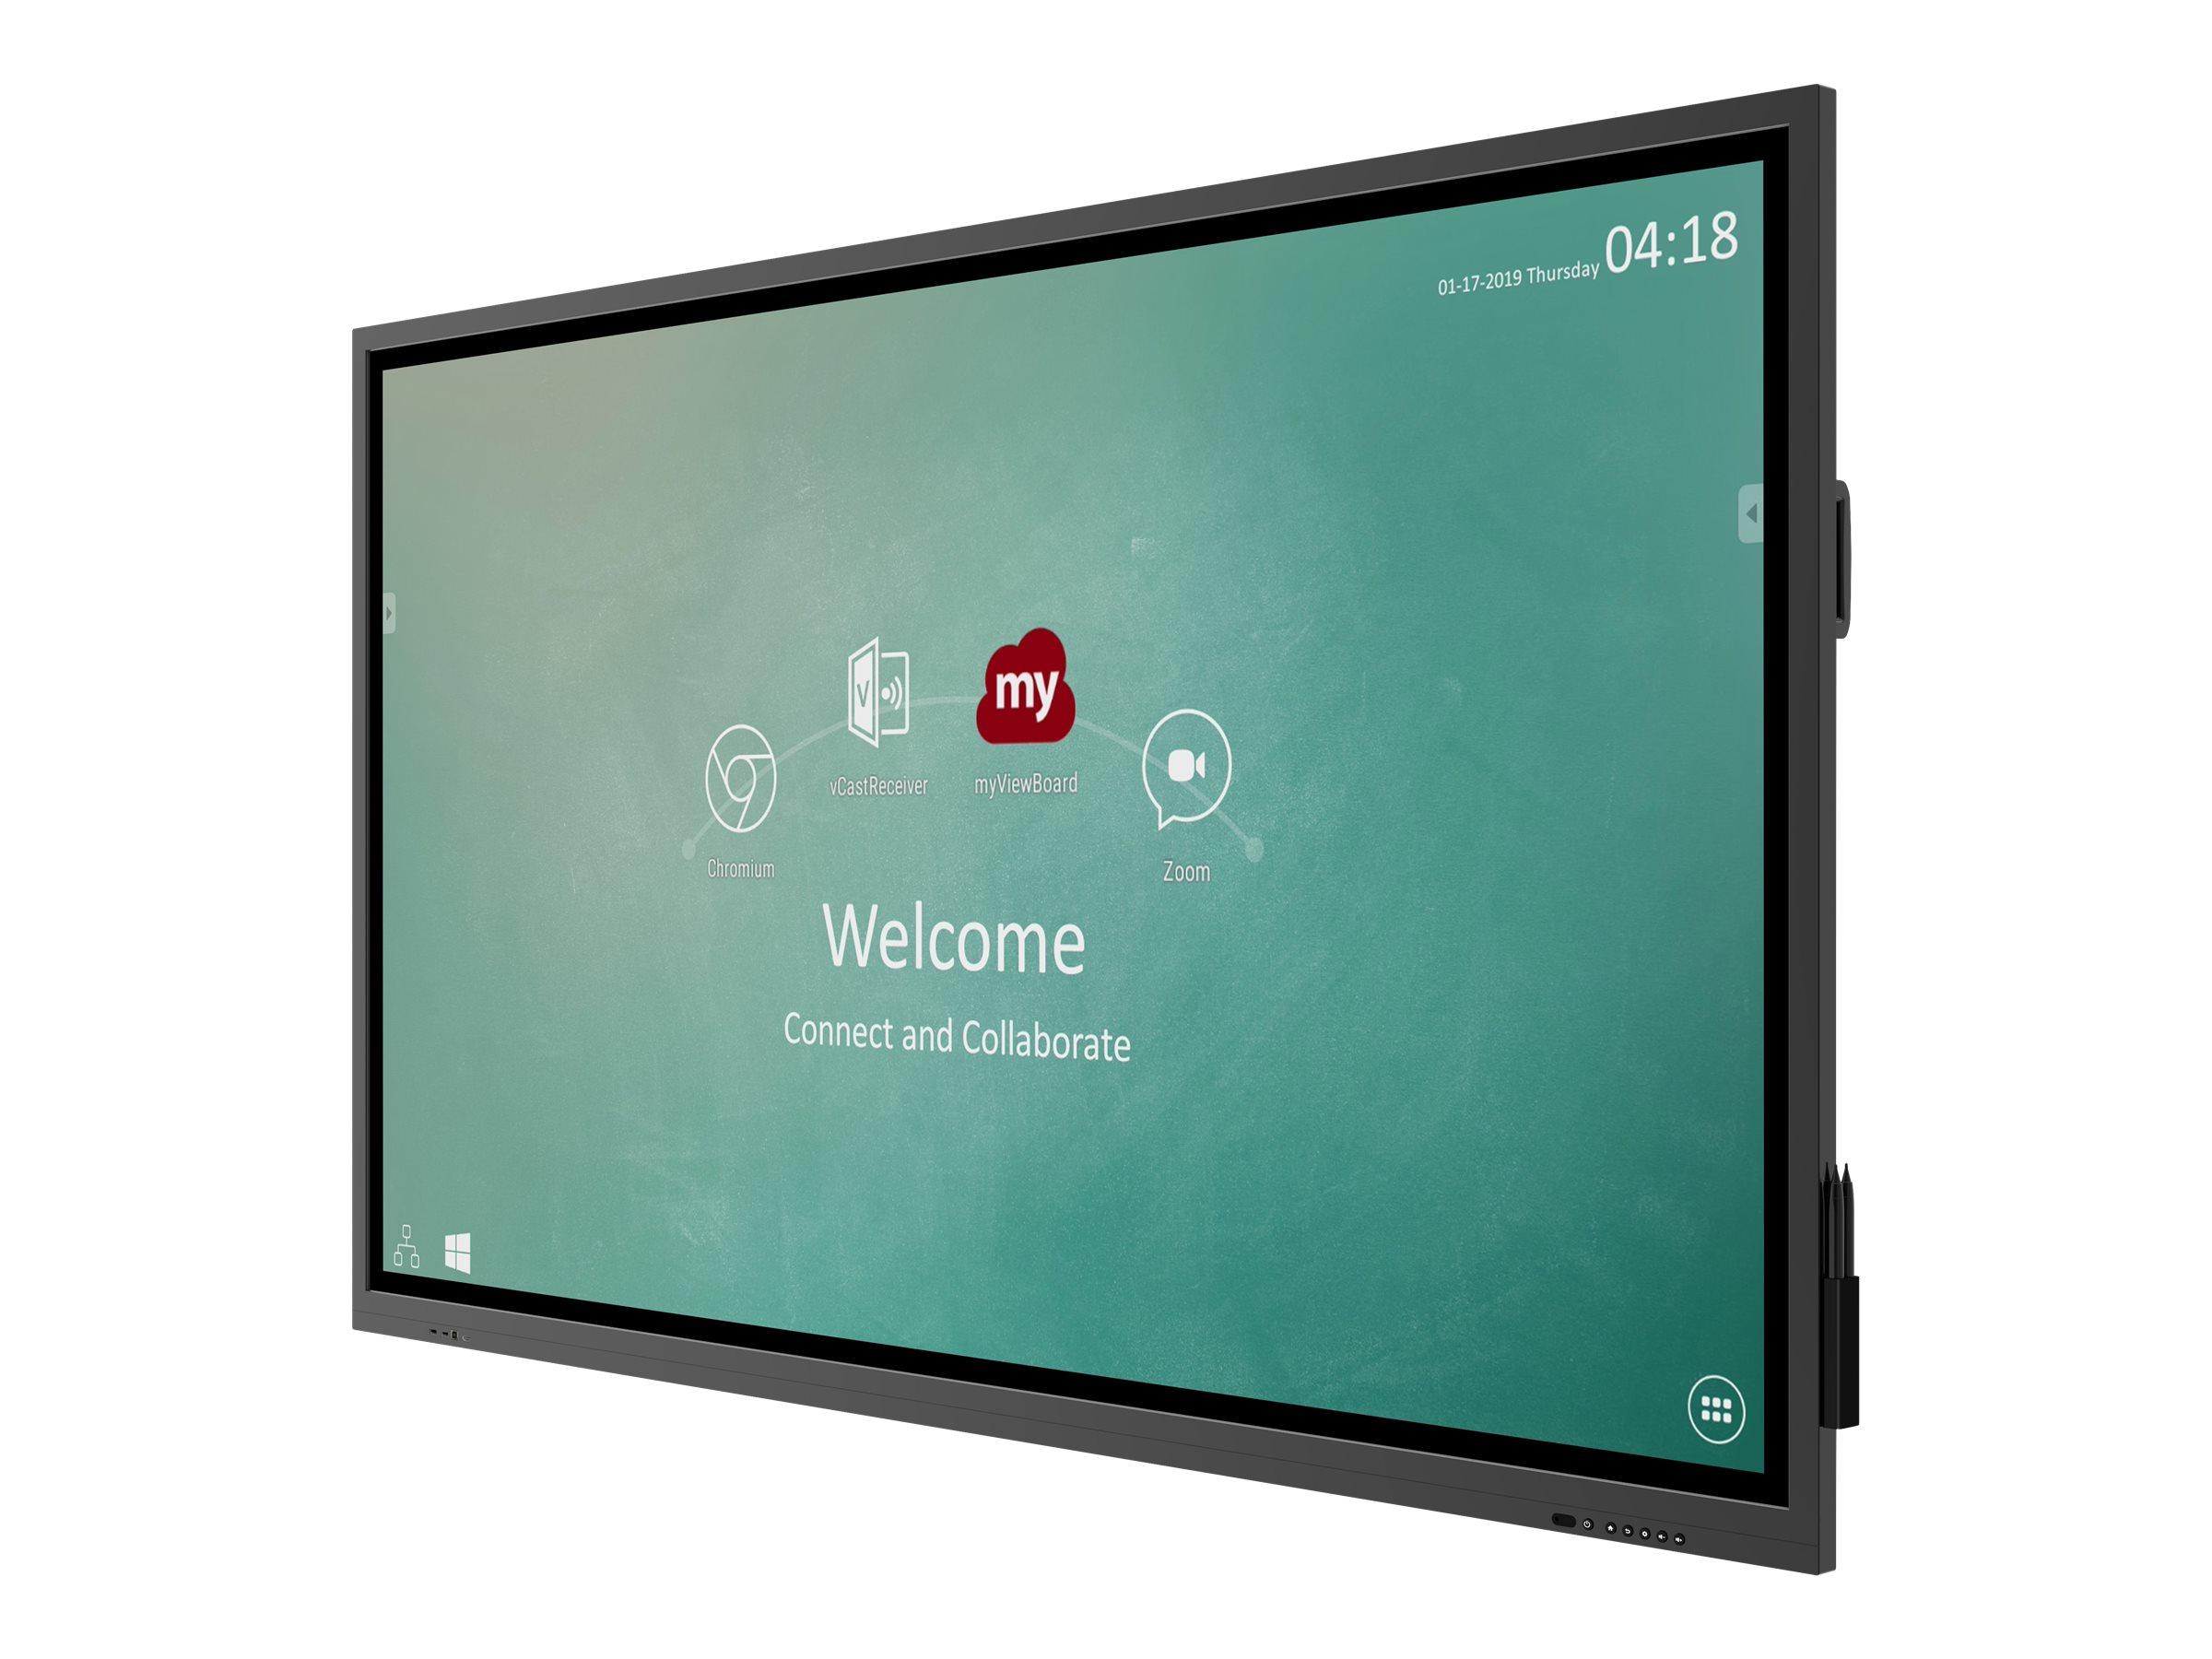 ViewSonic ViewBoard IFP7530 - 190.5 cm (75